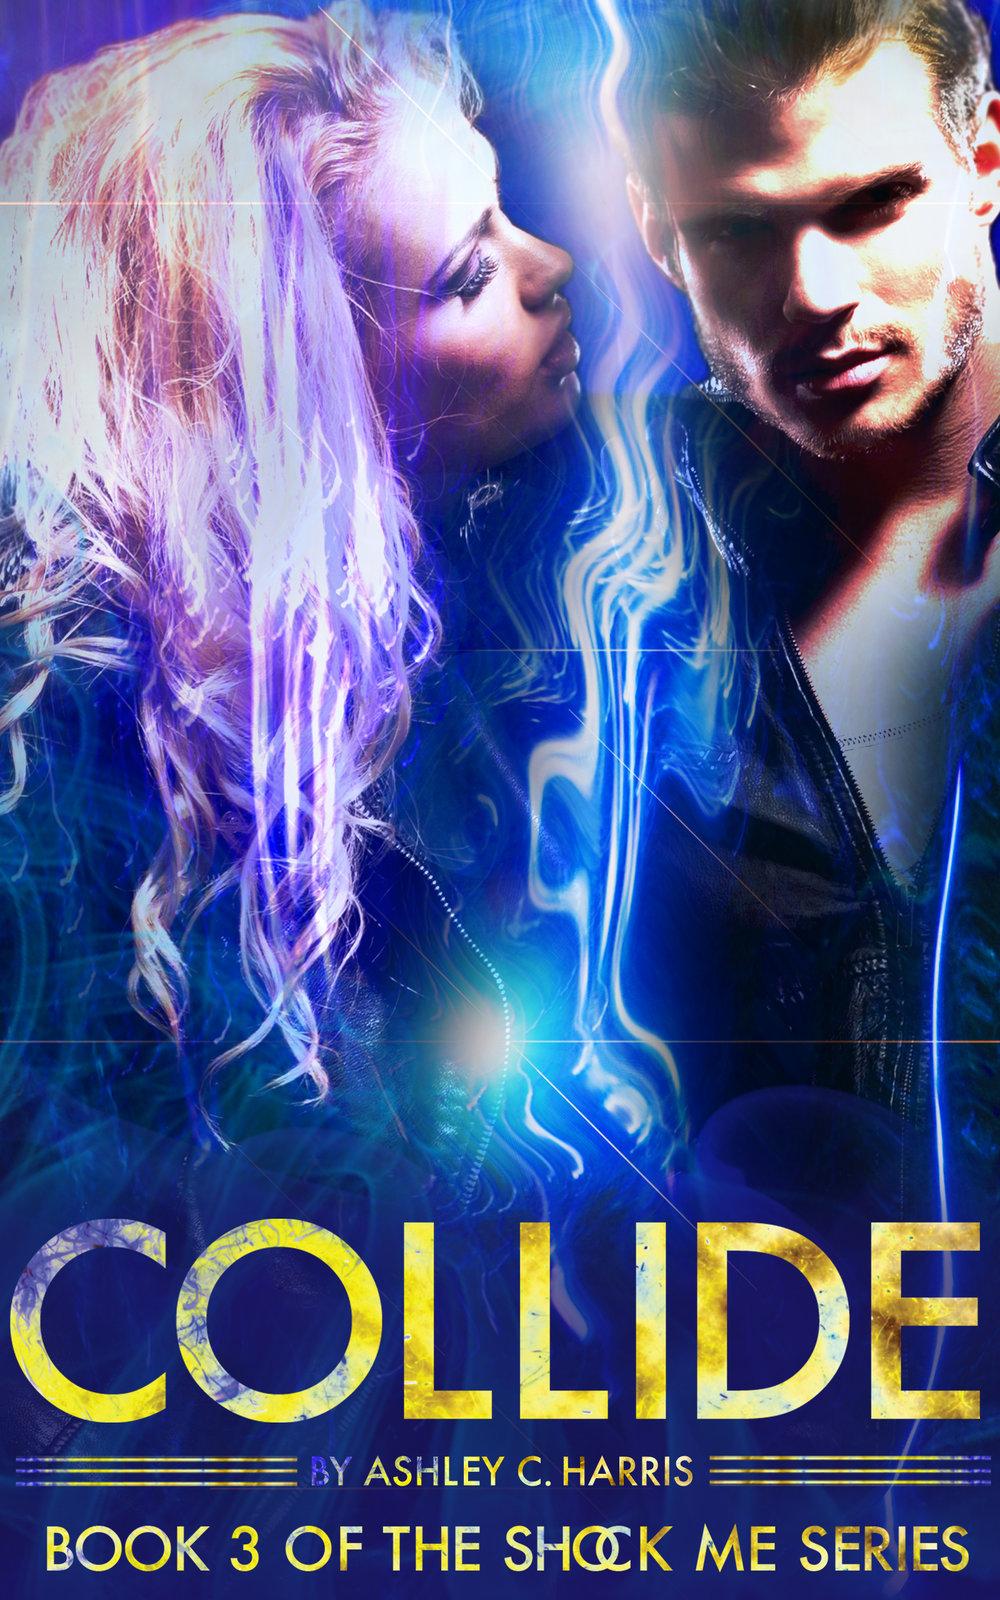 collide book cover.jpg